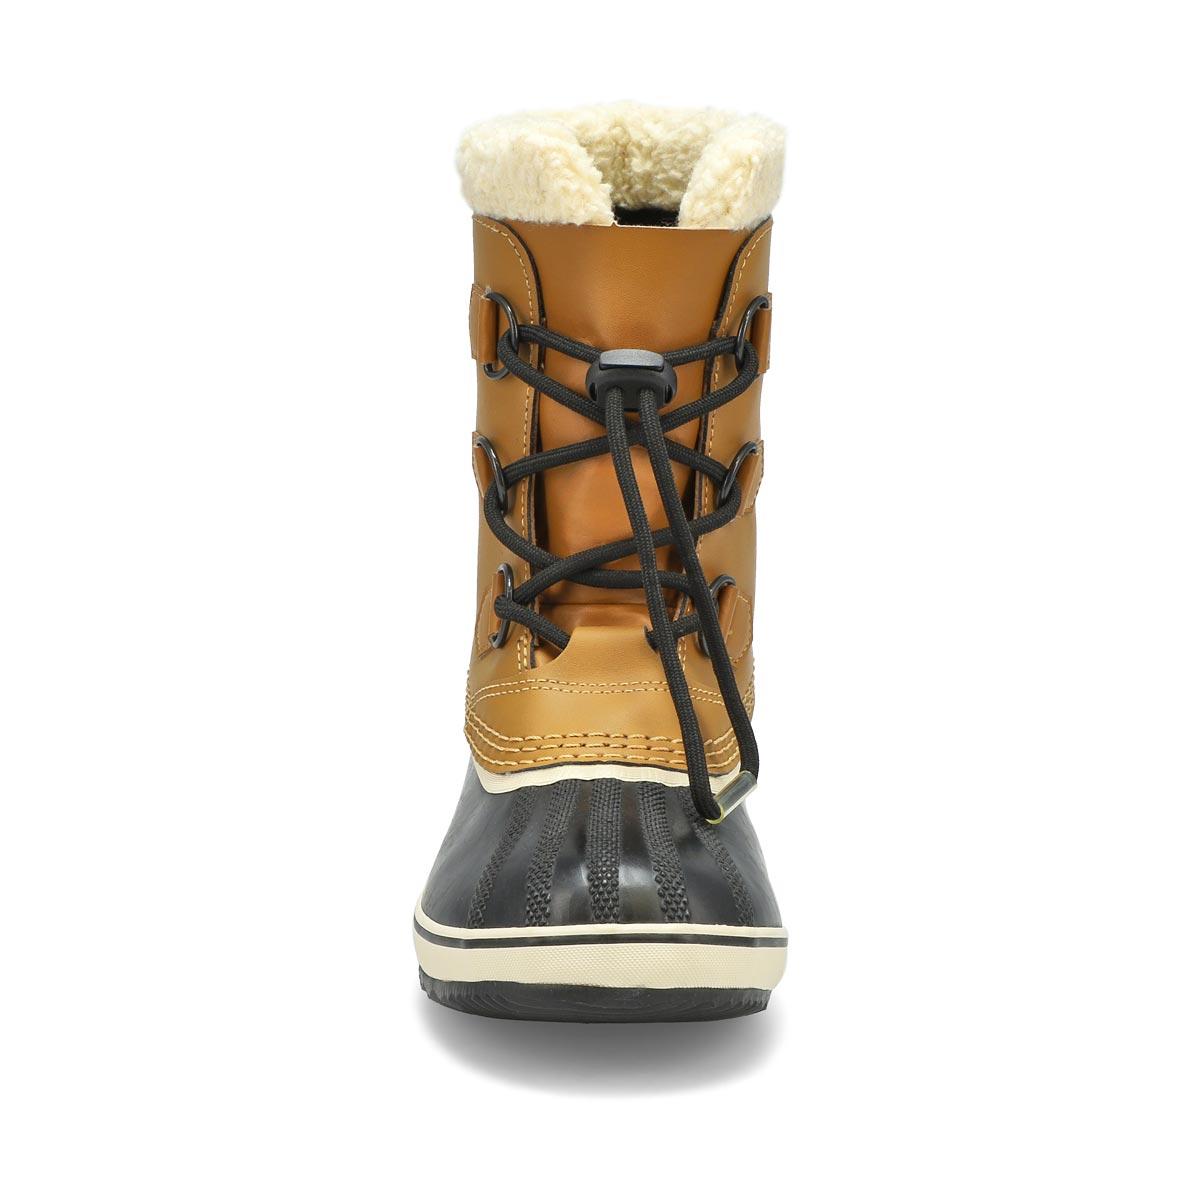 Kds Yoot Pac TP msqt wtpf snow boot